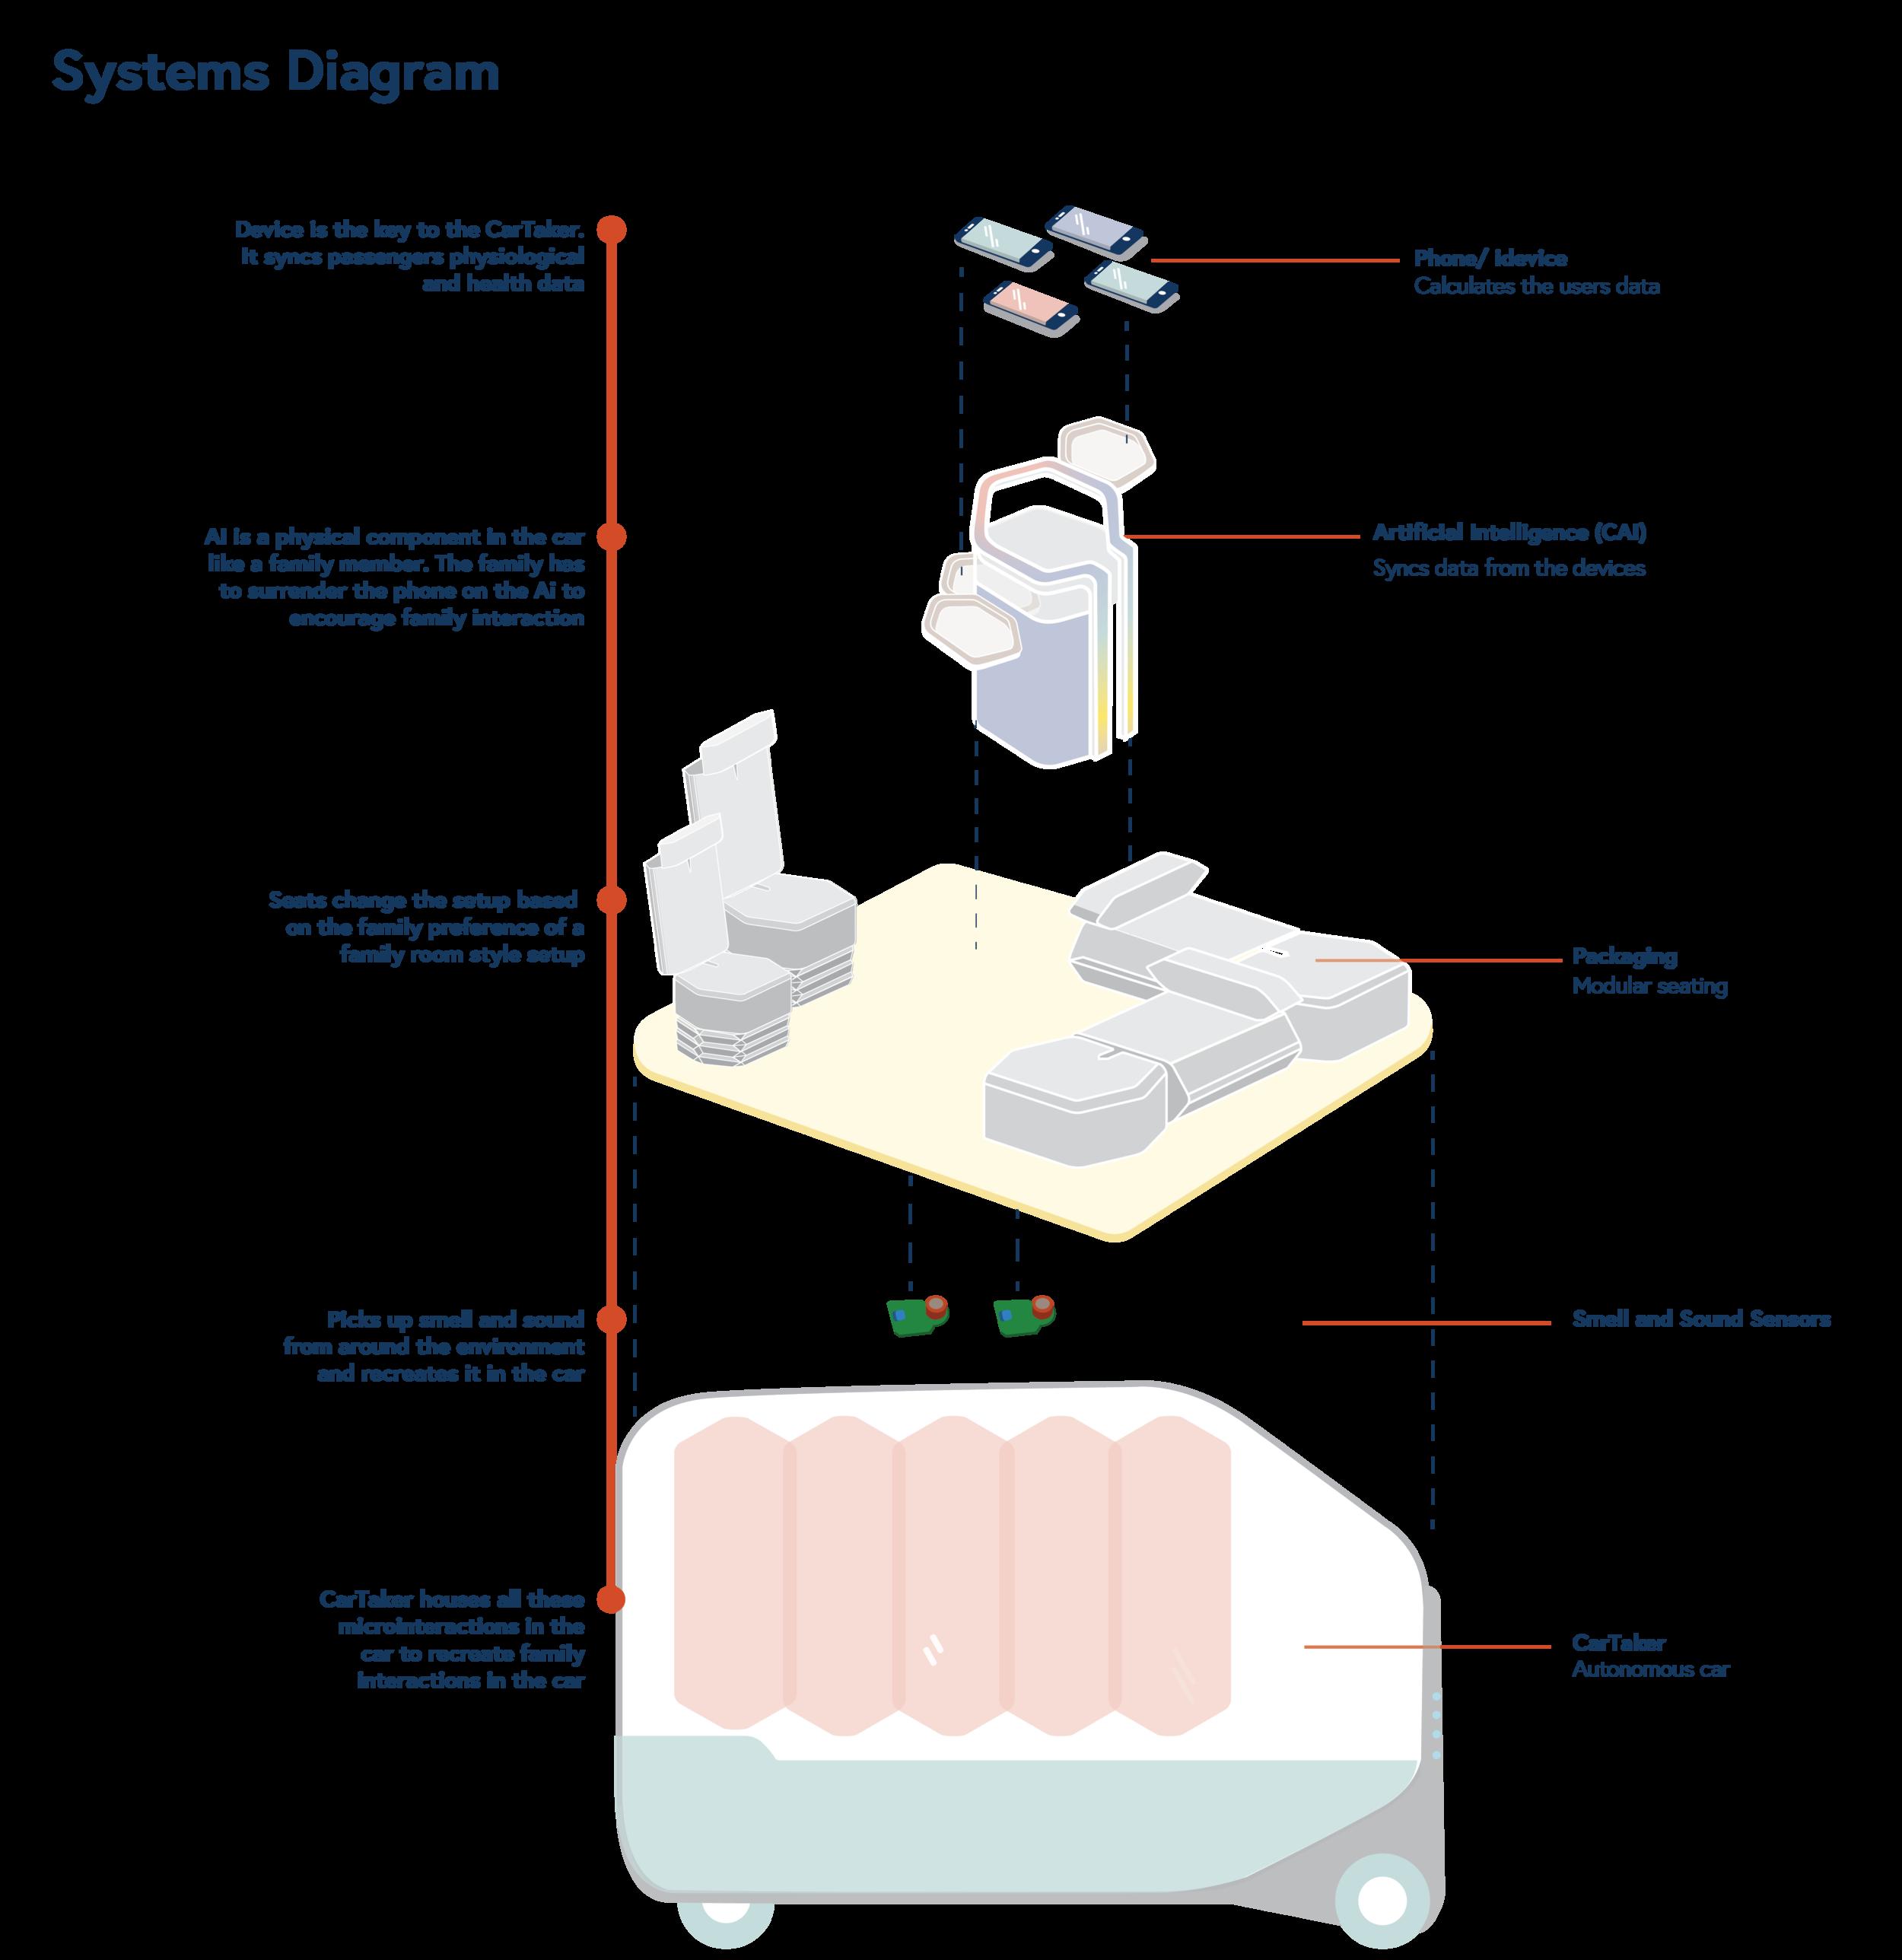 Driving sensation_systems diagram-09.png